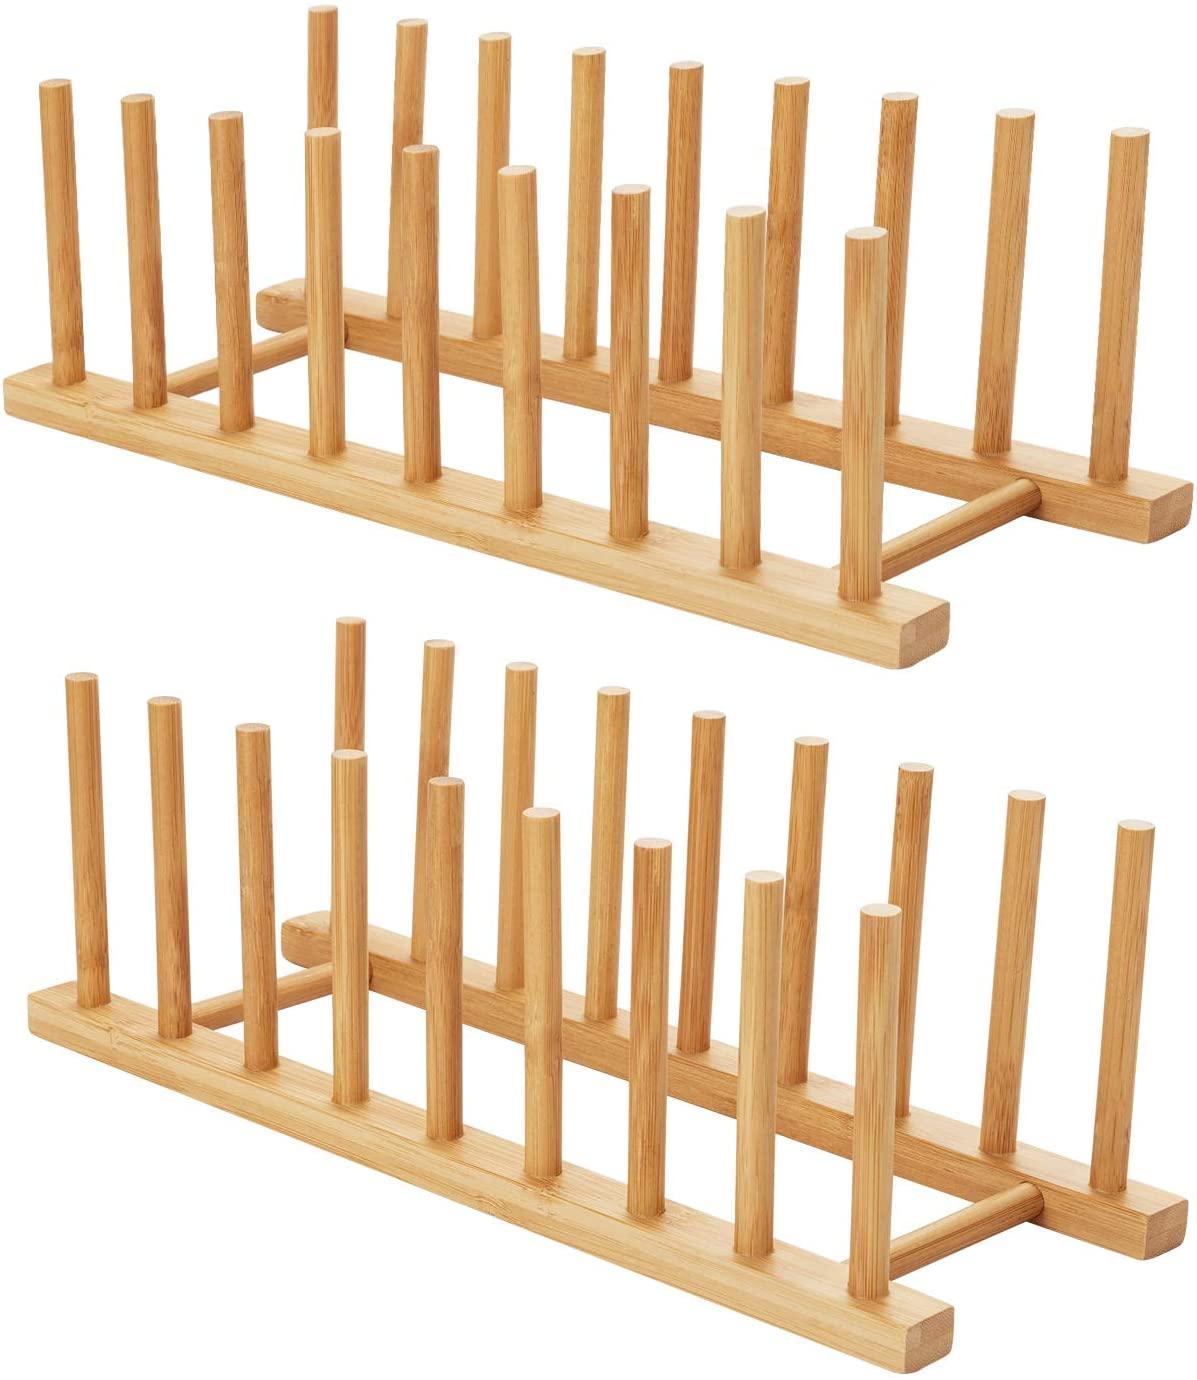 Best Vertical Plate Holders